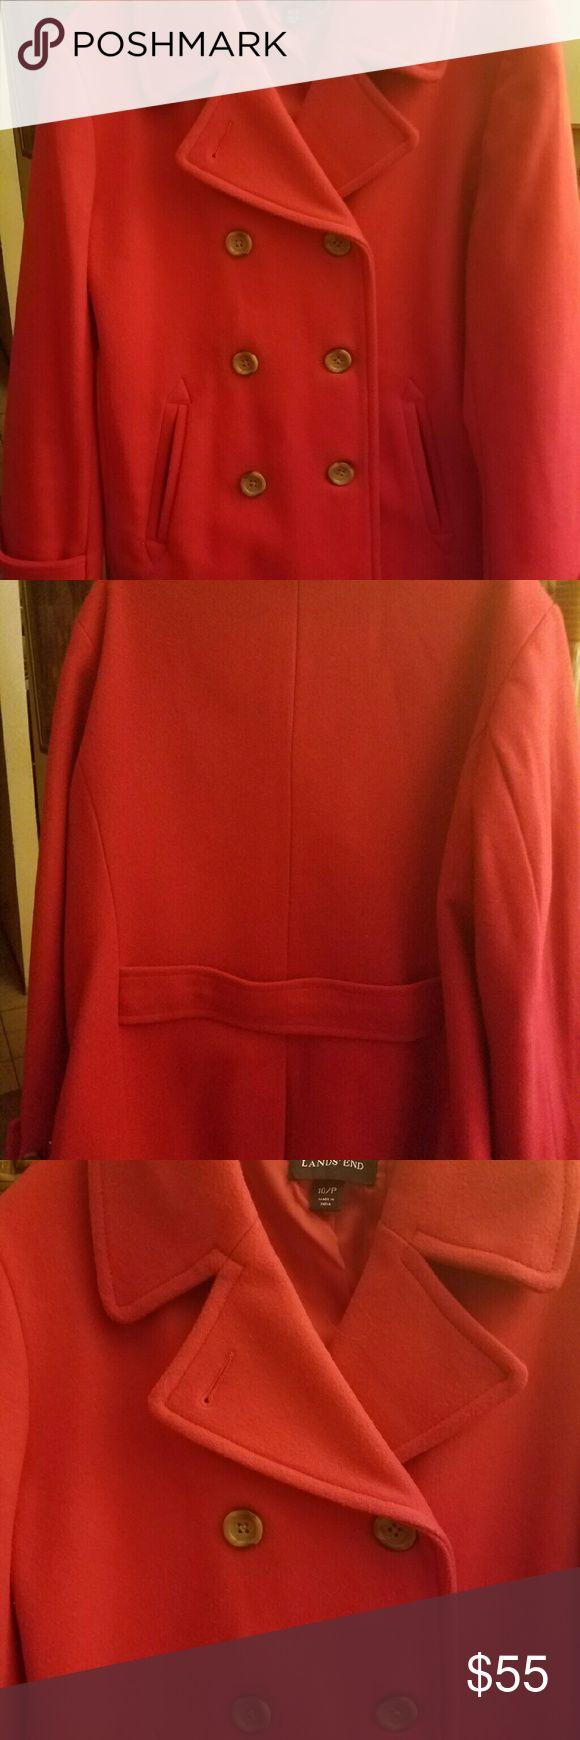 ❤️ Land's End red Pea  Coat size 10P ❤️ 🚨🚨SALE Land's End red Pea  Coat size 10P 🚨🚨SALE🚨🚨 Land's End  Jackets & Coats Pea Coats